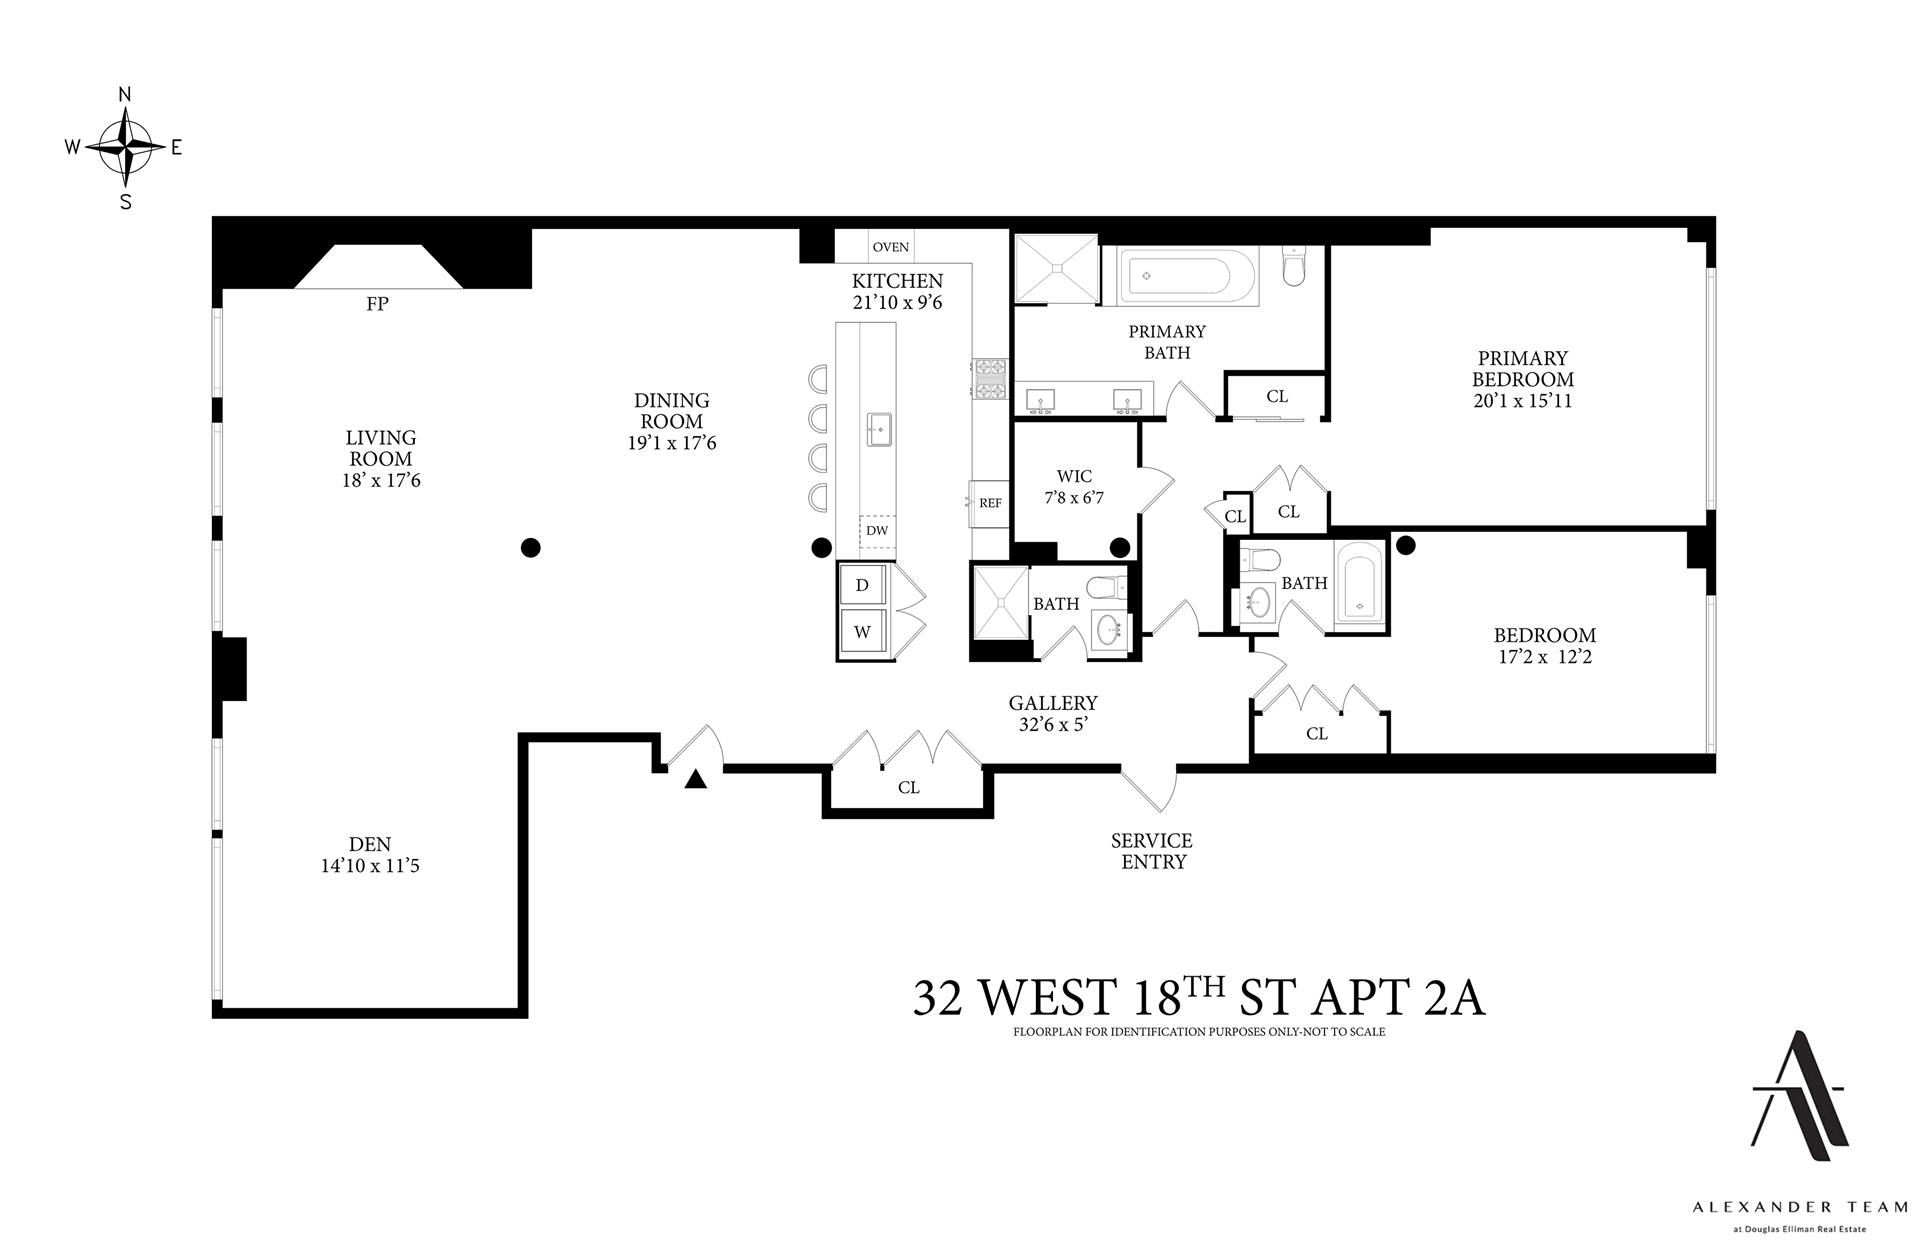 32 West 18th Street Flatiron District New York NY 10011